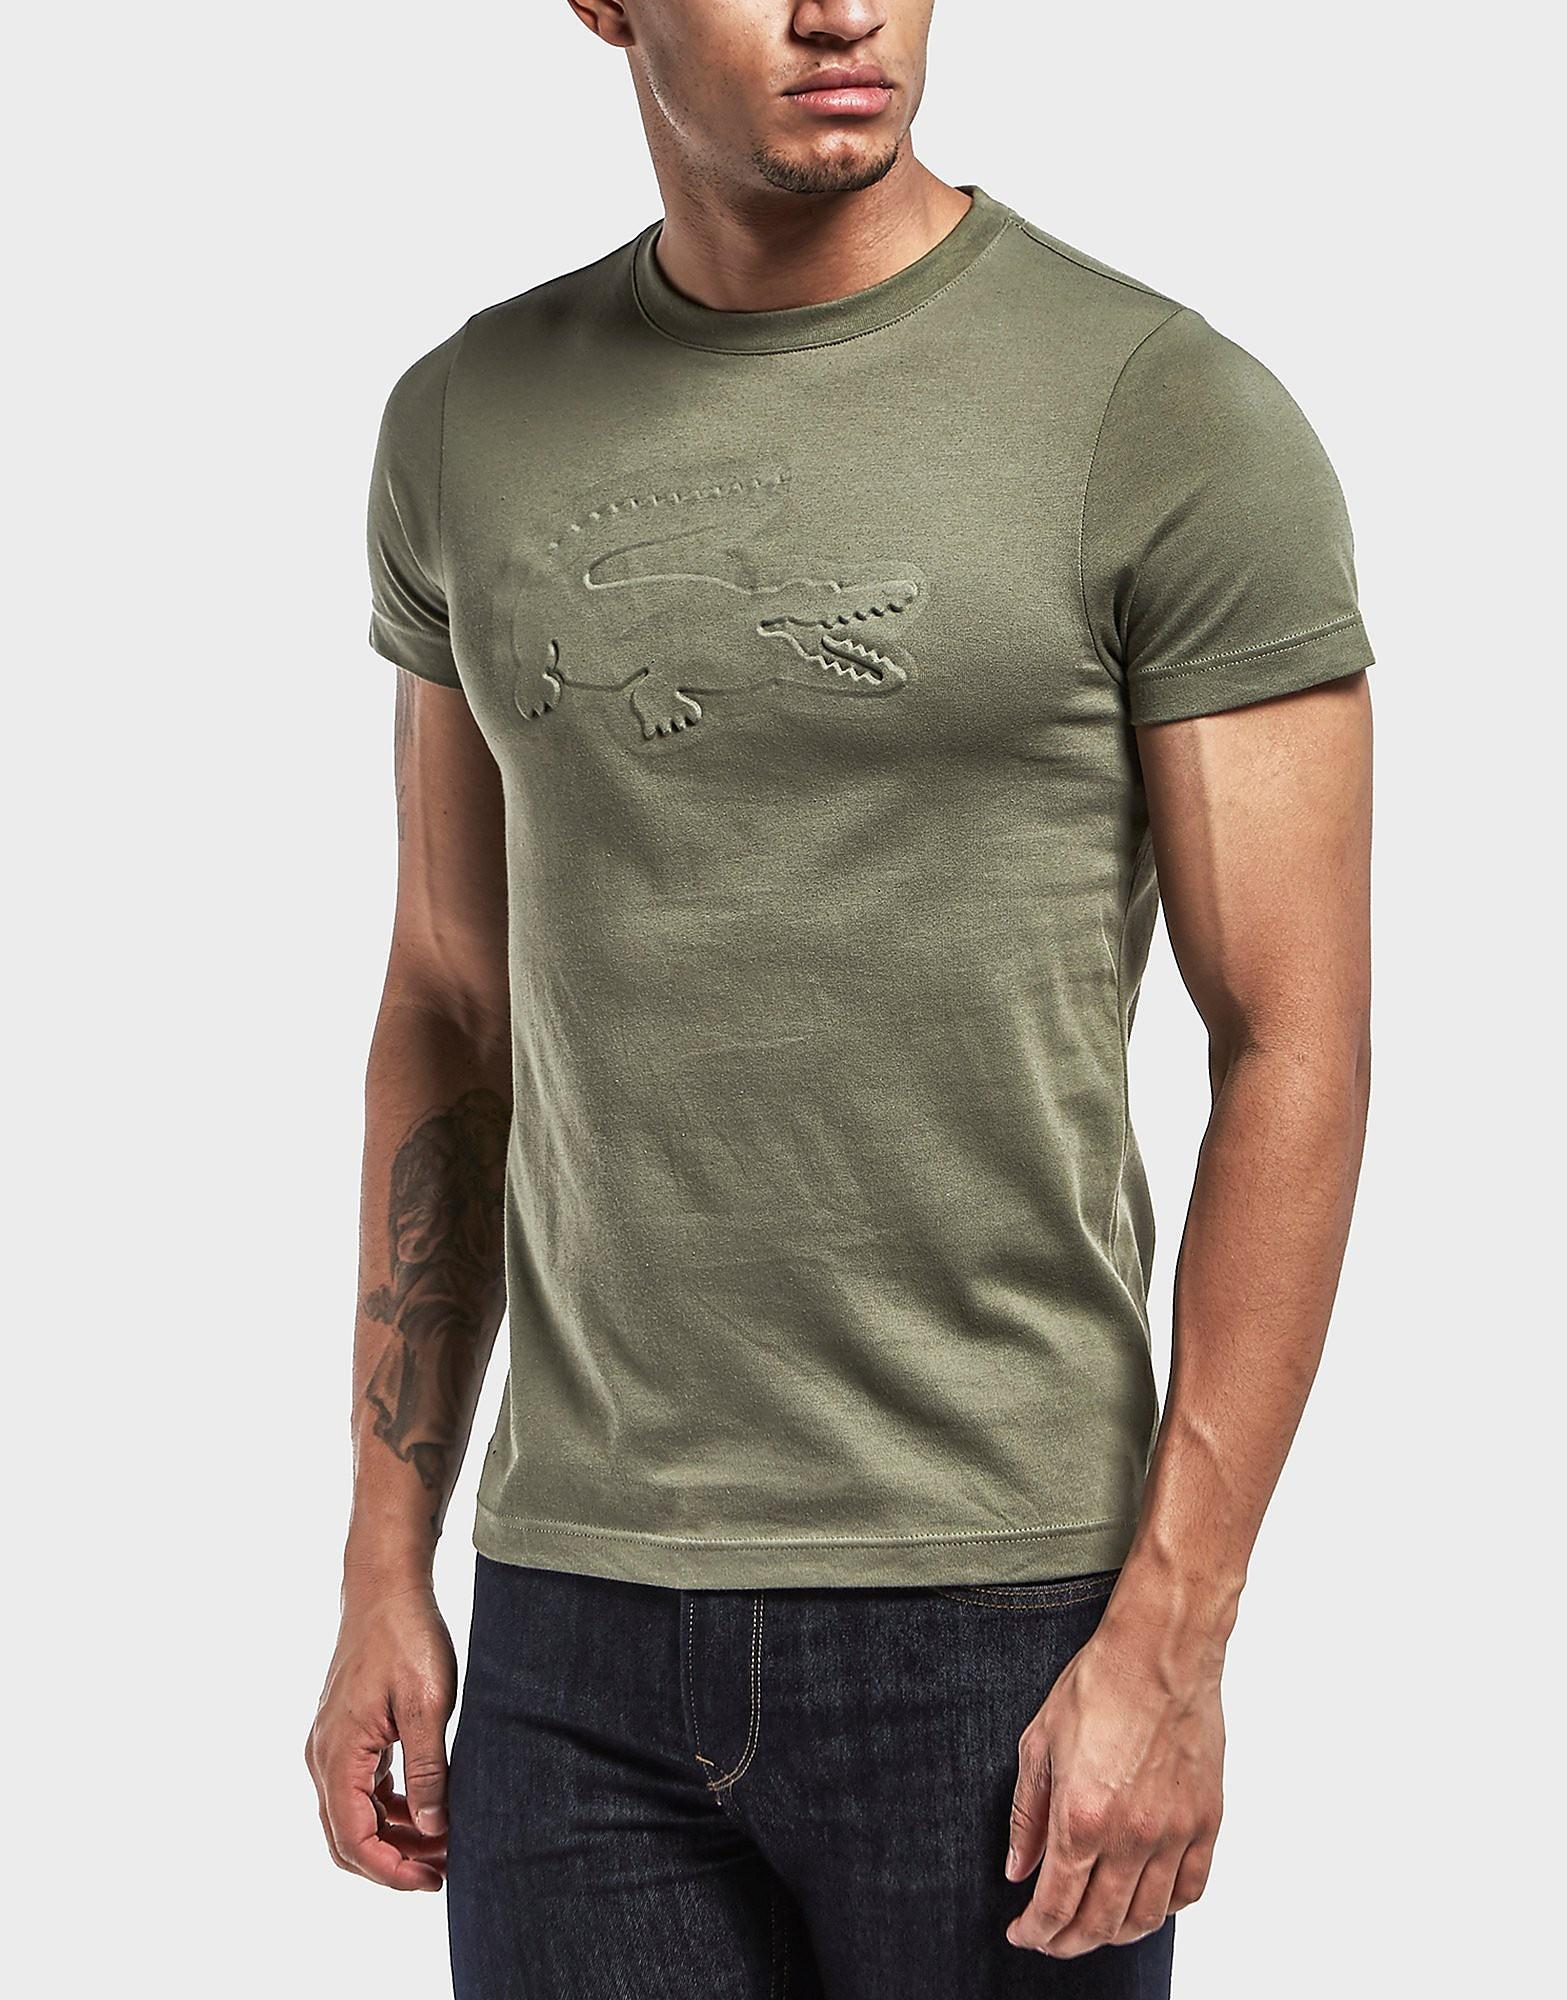 Lacoste Embossed Croc Short Sleeve T-Shirt